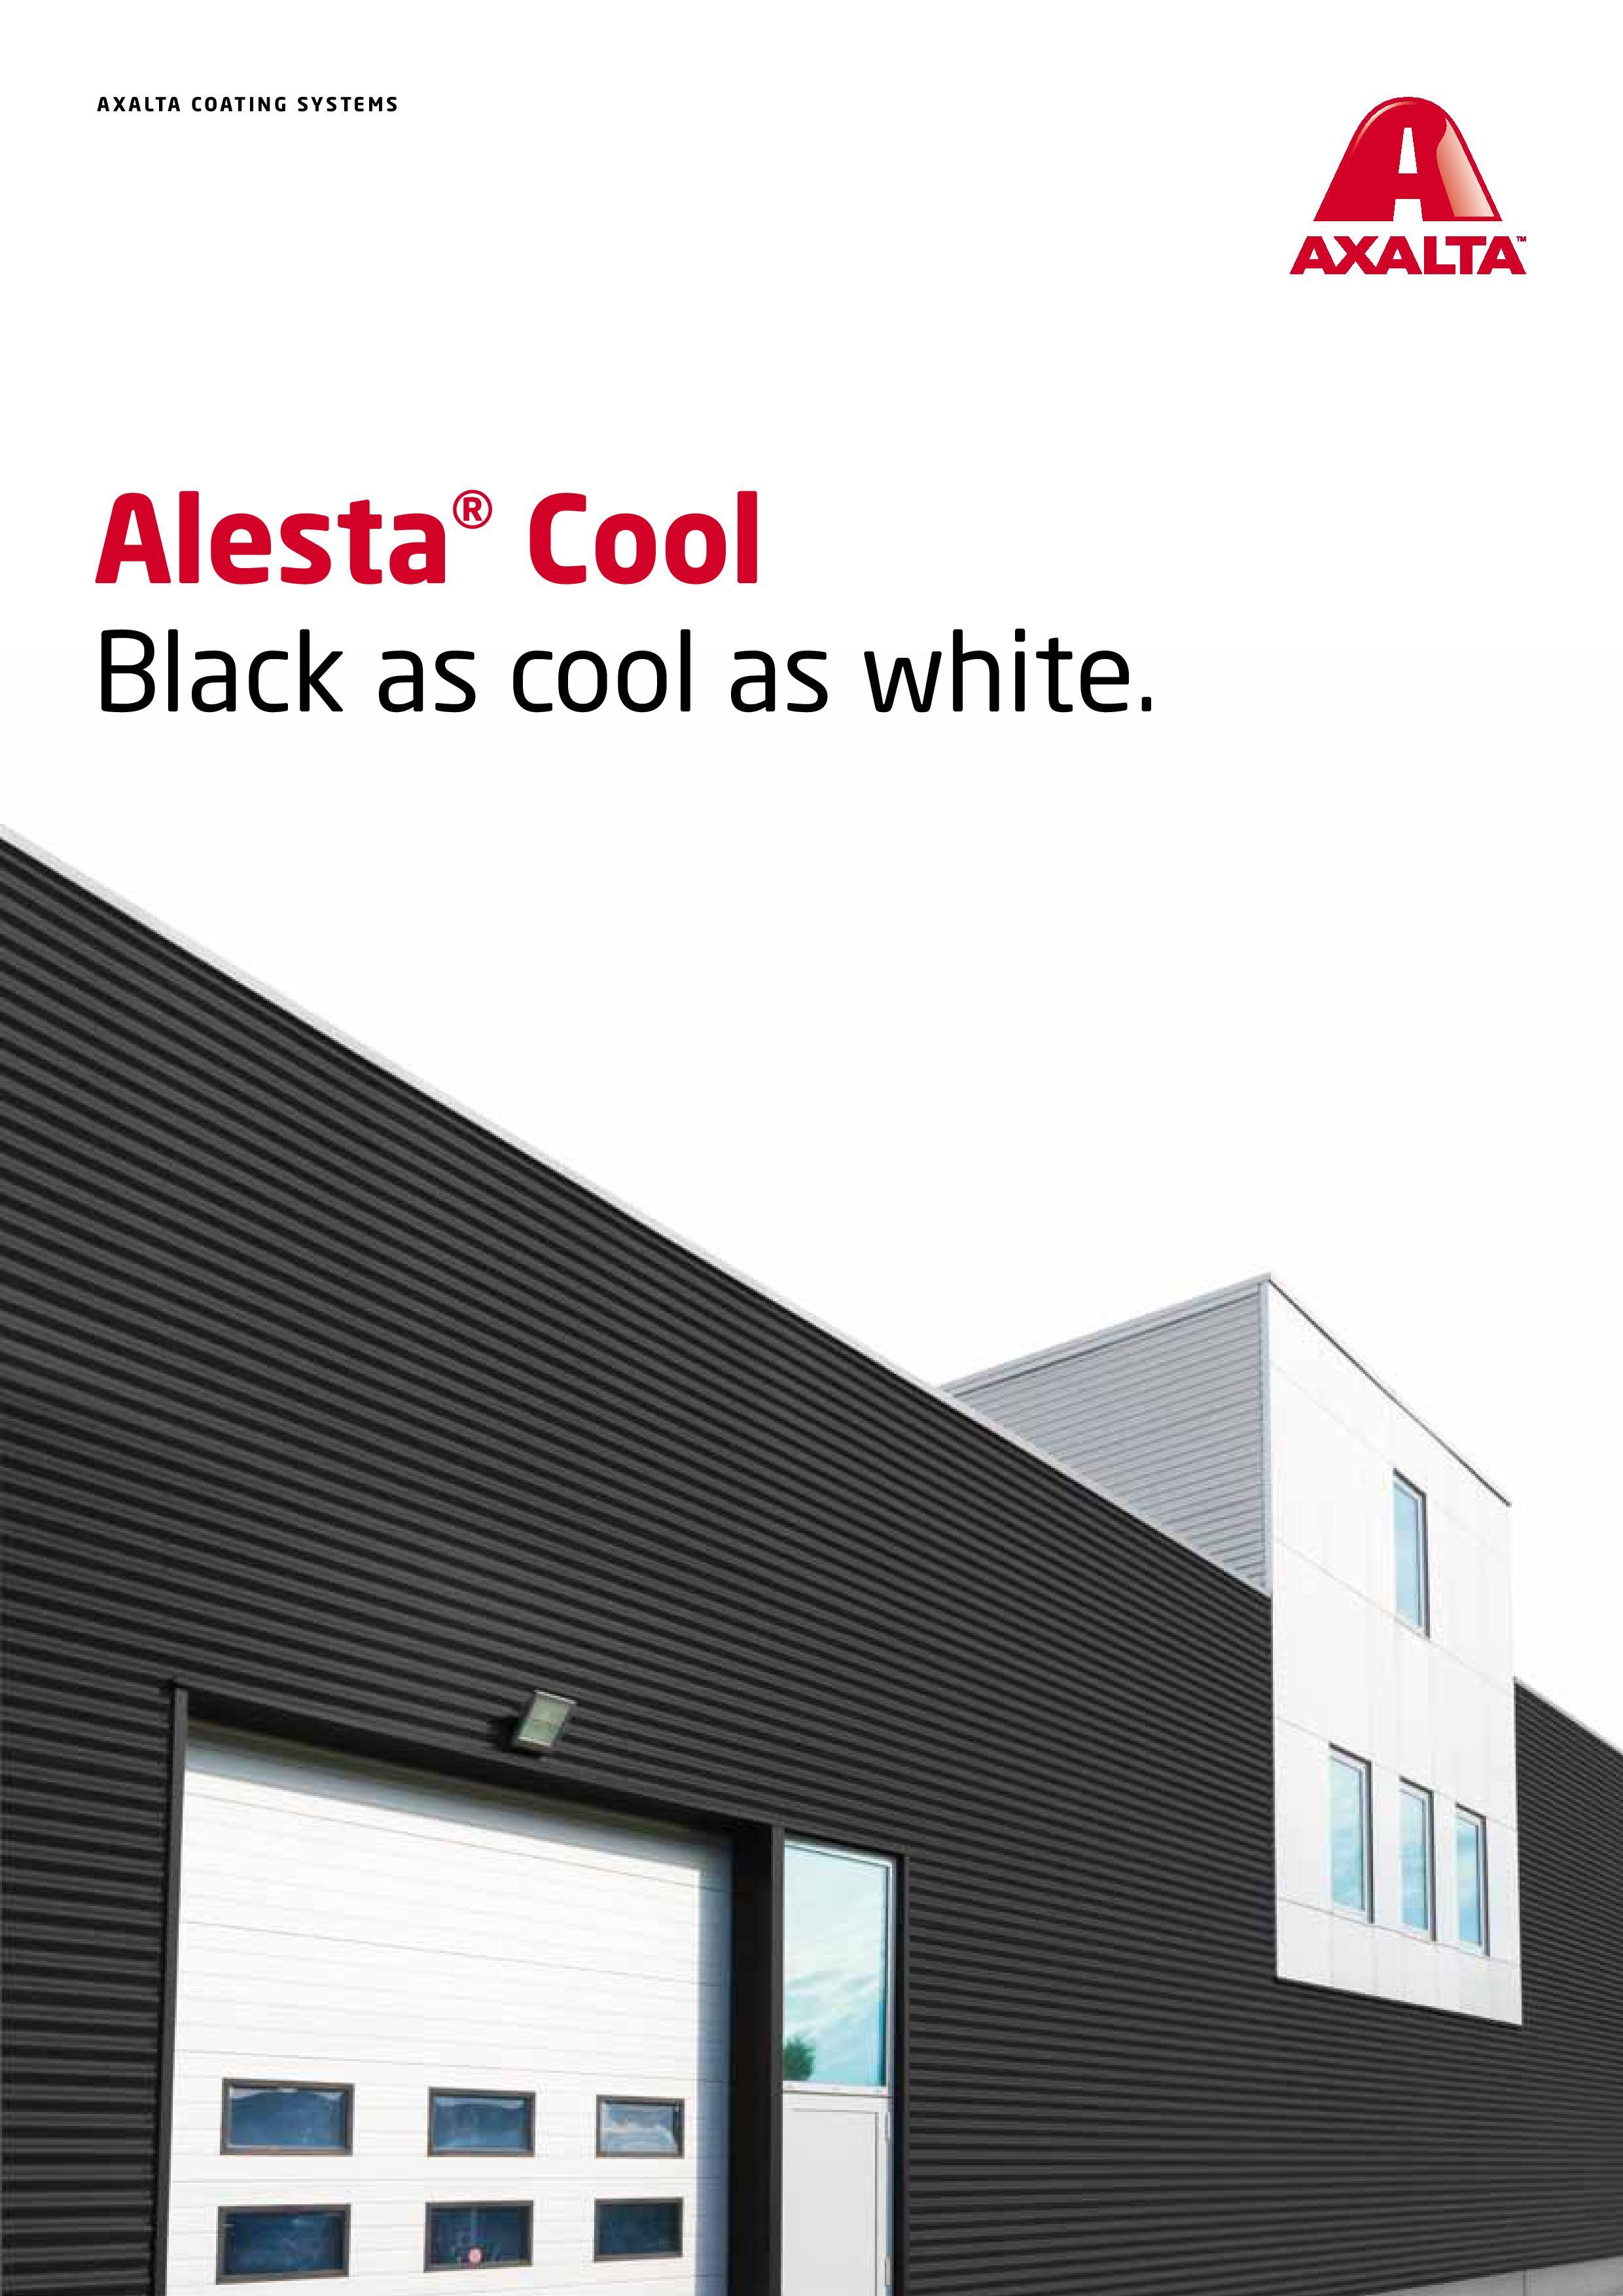 Alesta Cool by Axalta Powder Coatings EMEA   Media